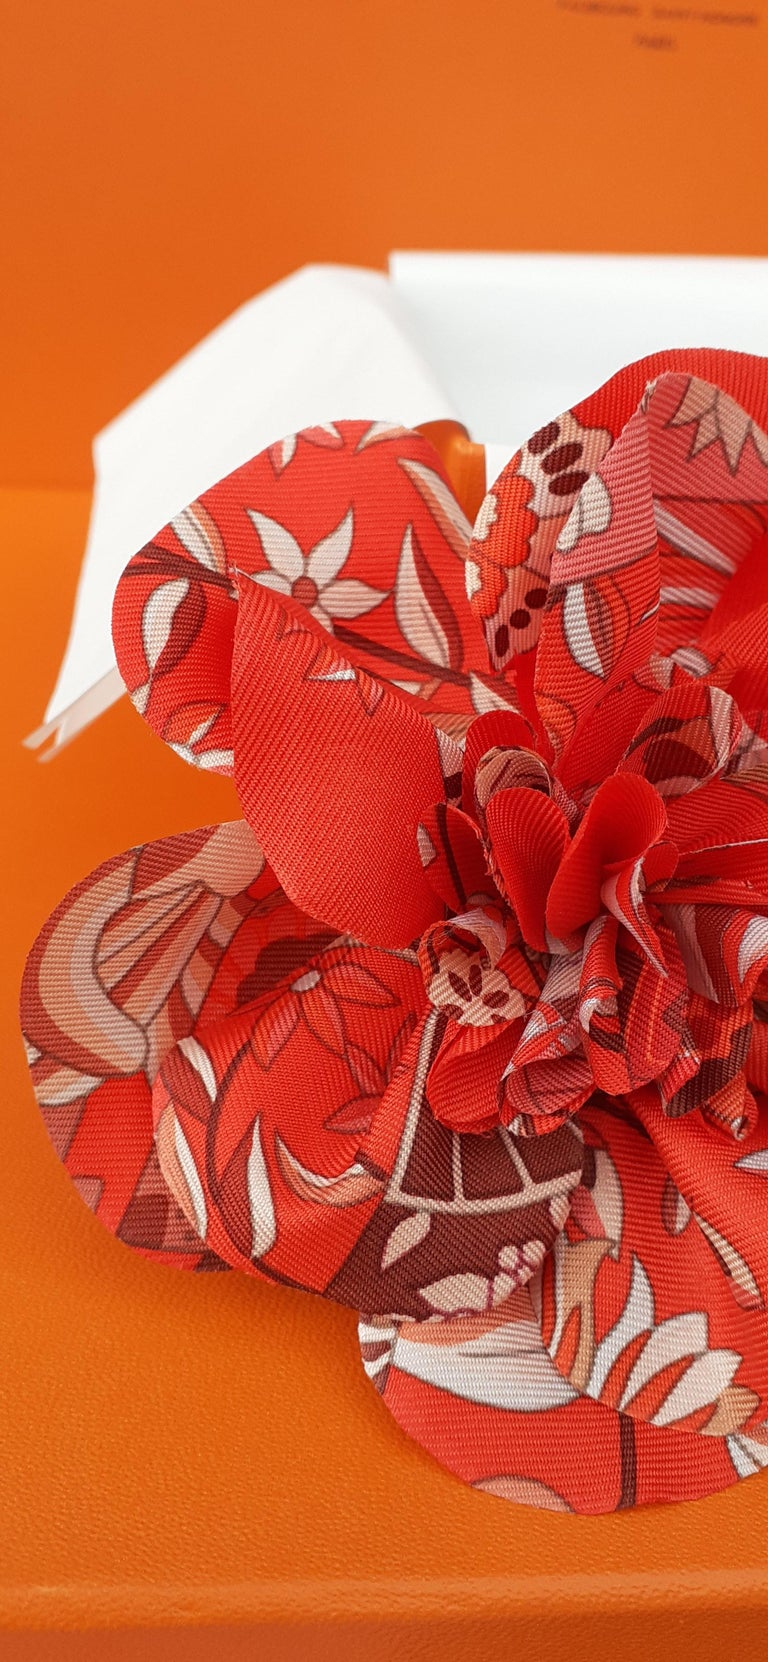 Exceptional Hermès Rare Silk Scarf Brooch Charm La Fleur Red 2